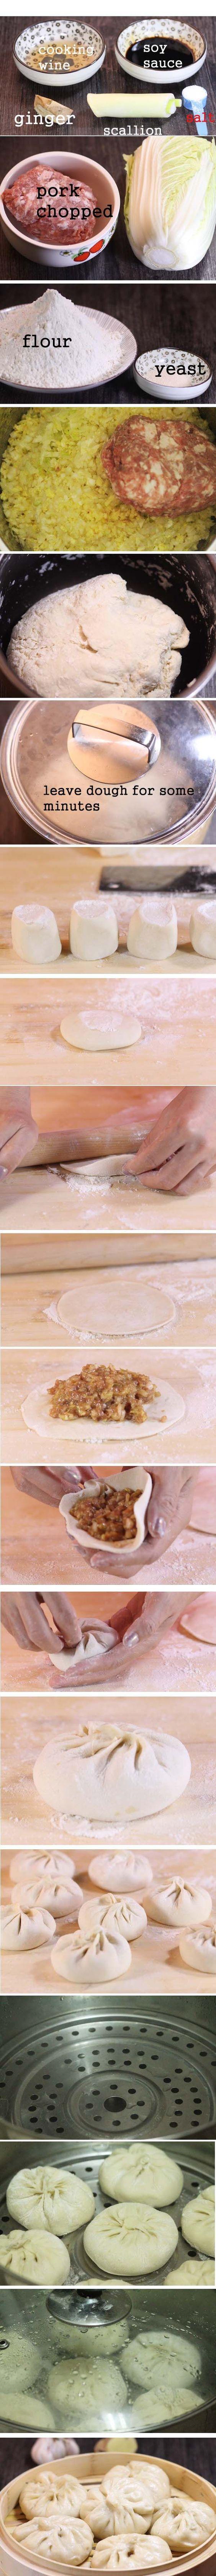 How to make perfect Chinese Baozi?